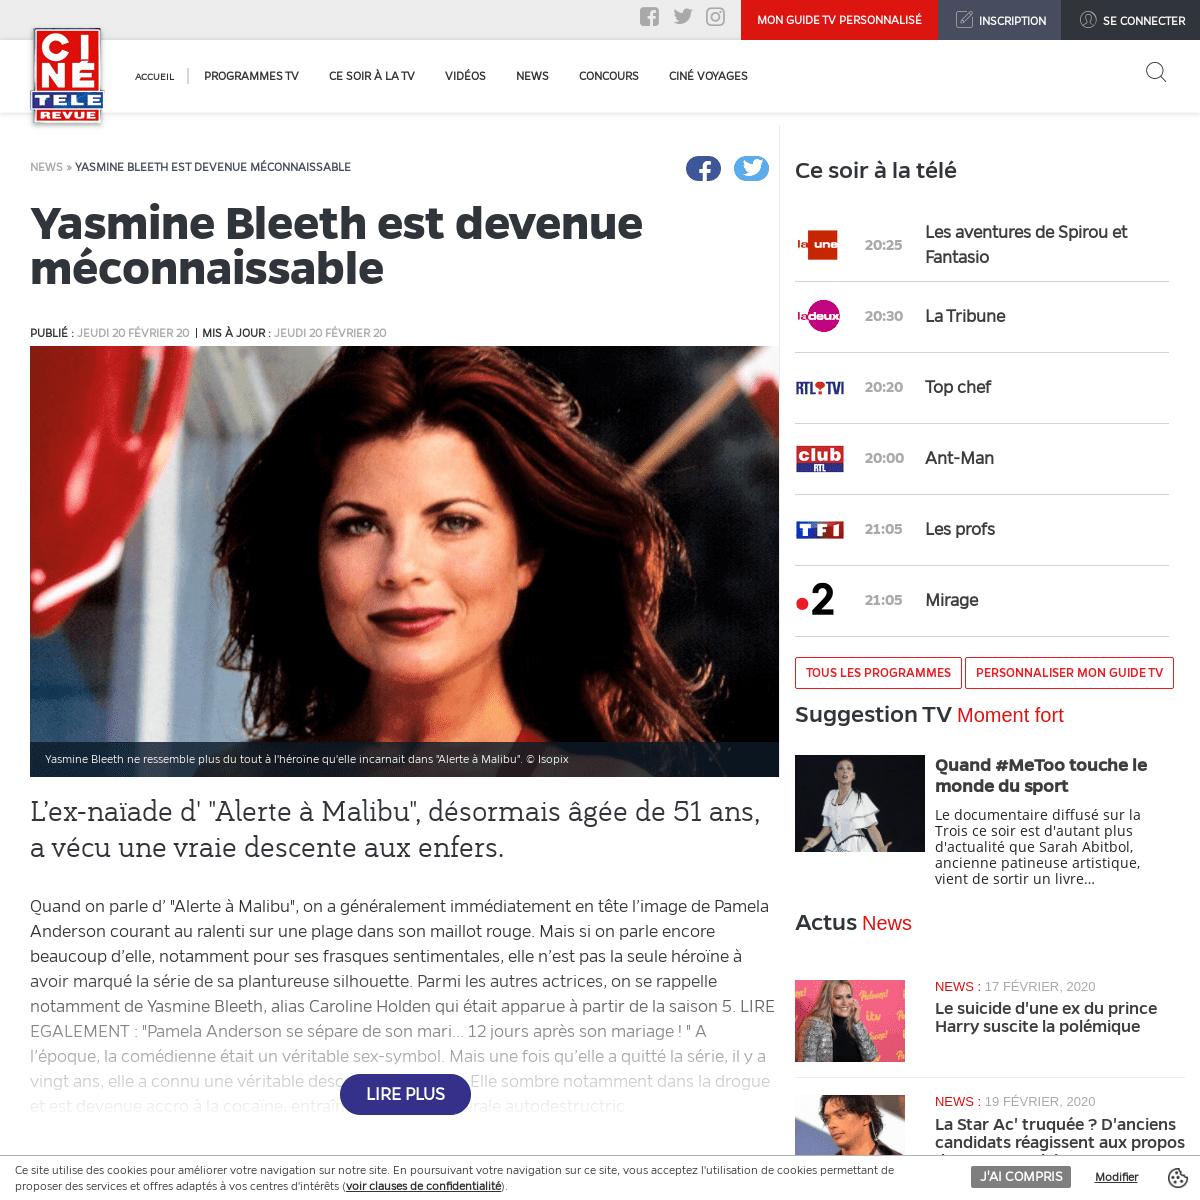 Yasmine Bleeth est devenue méconnaissable